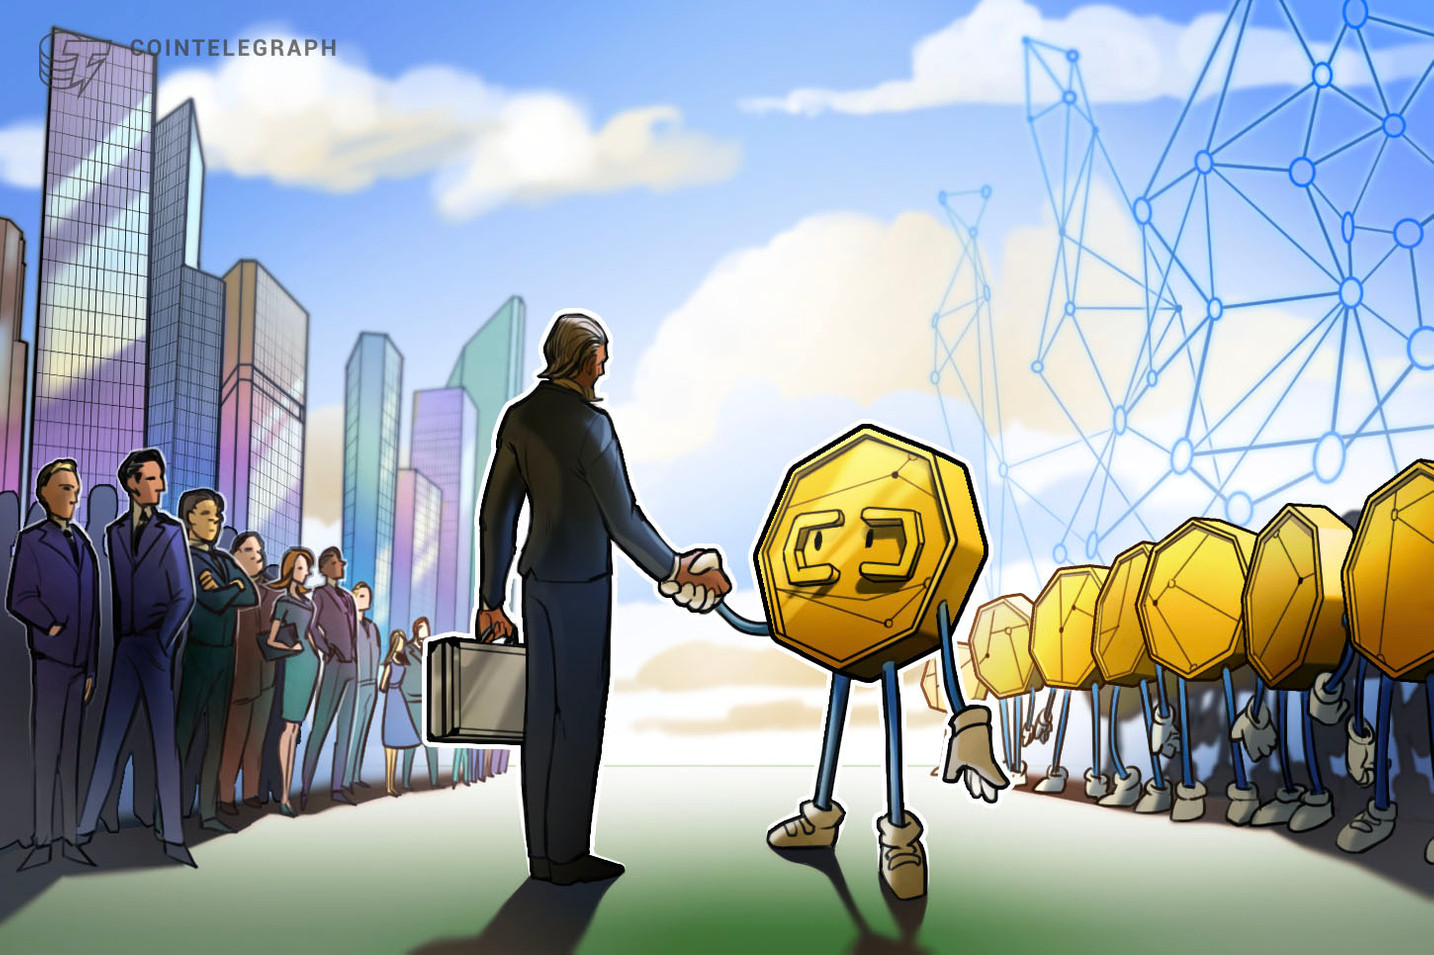 Cripto exchange Bitstamp anuncia parceria com grande banco suíço digital